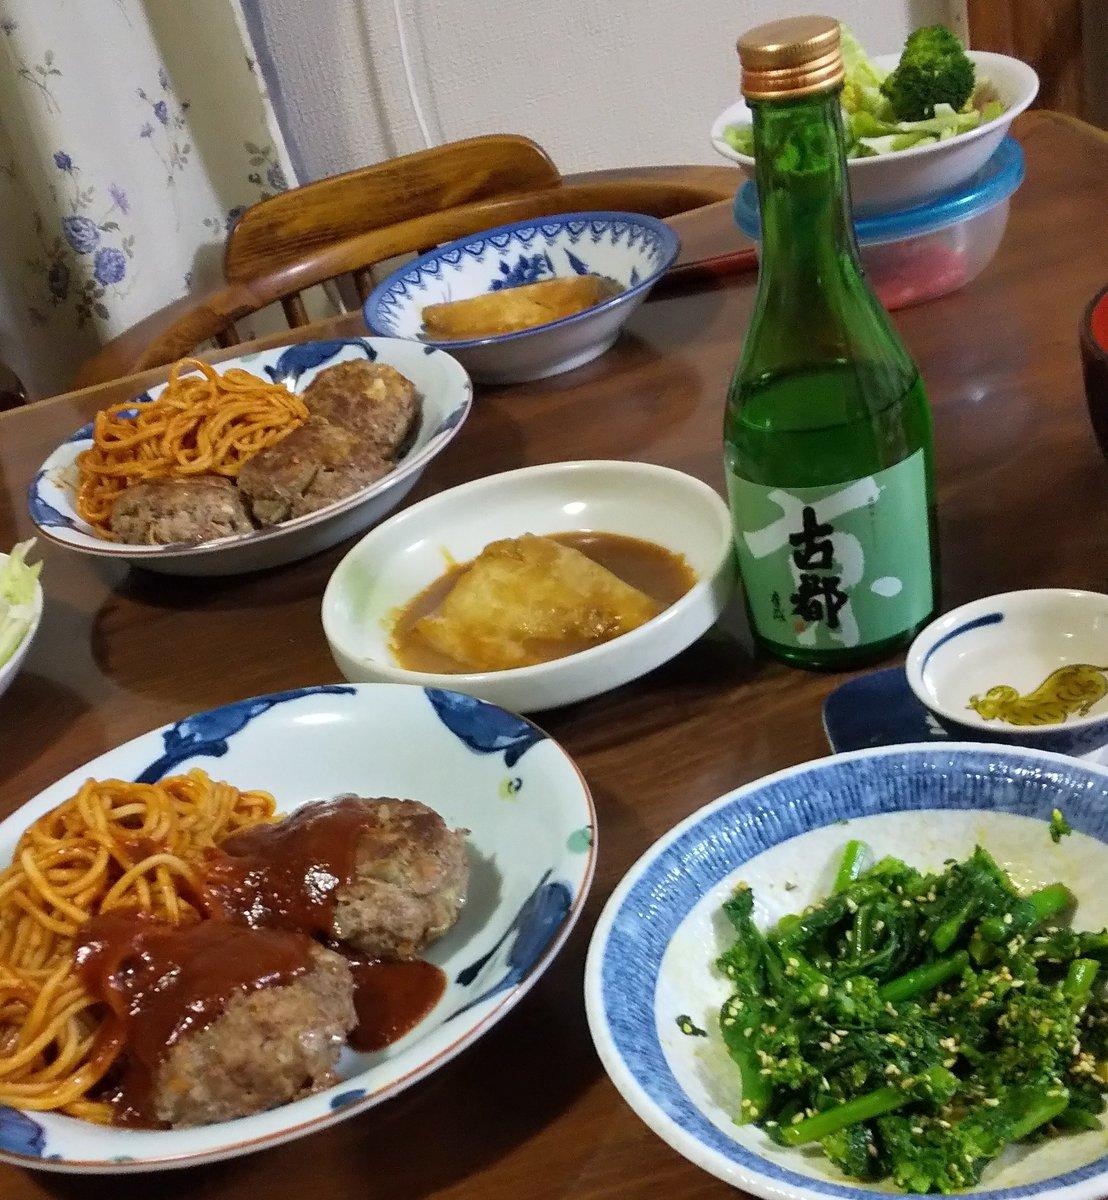 test ツイッターメディア - 晩ご飯。 美味しいよ、ハンバーグ。オイラのソース。 鯖味噌。 菜の花辛子和えでお酒、佐々木酒造「古都」 https://t.co/EKAKVCfy4X